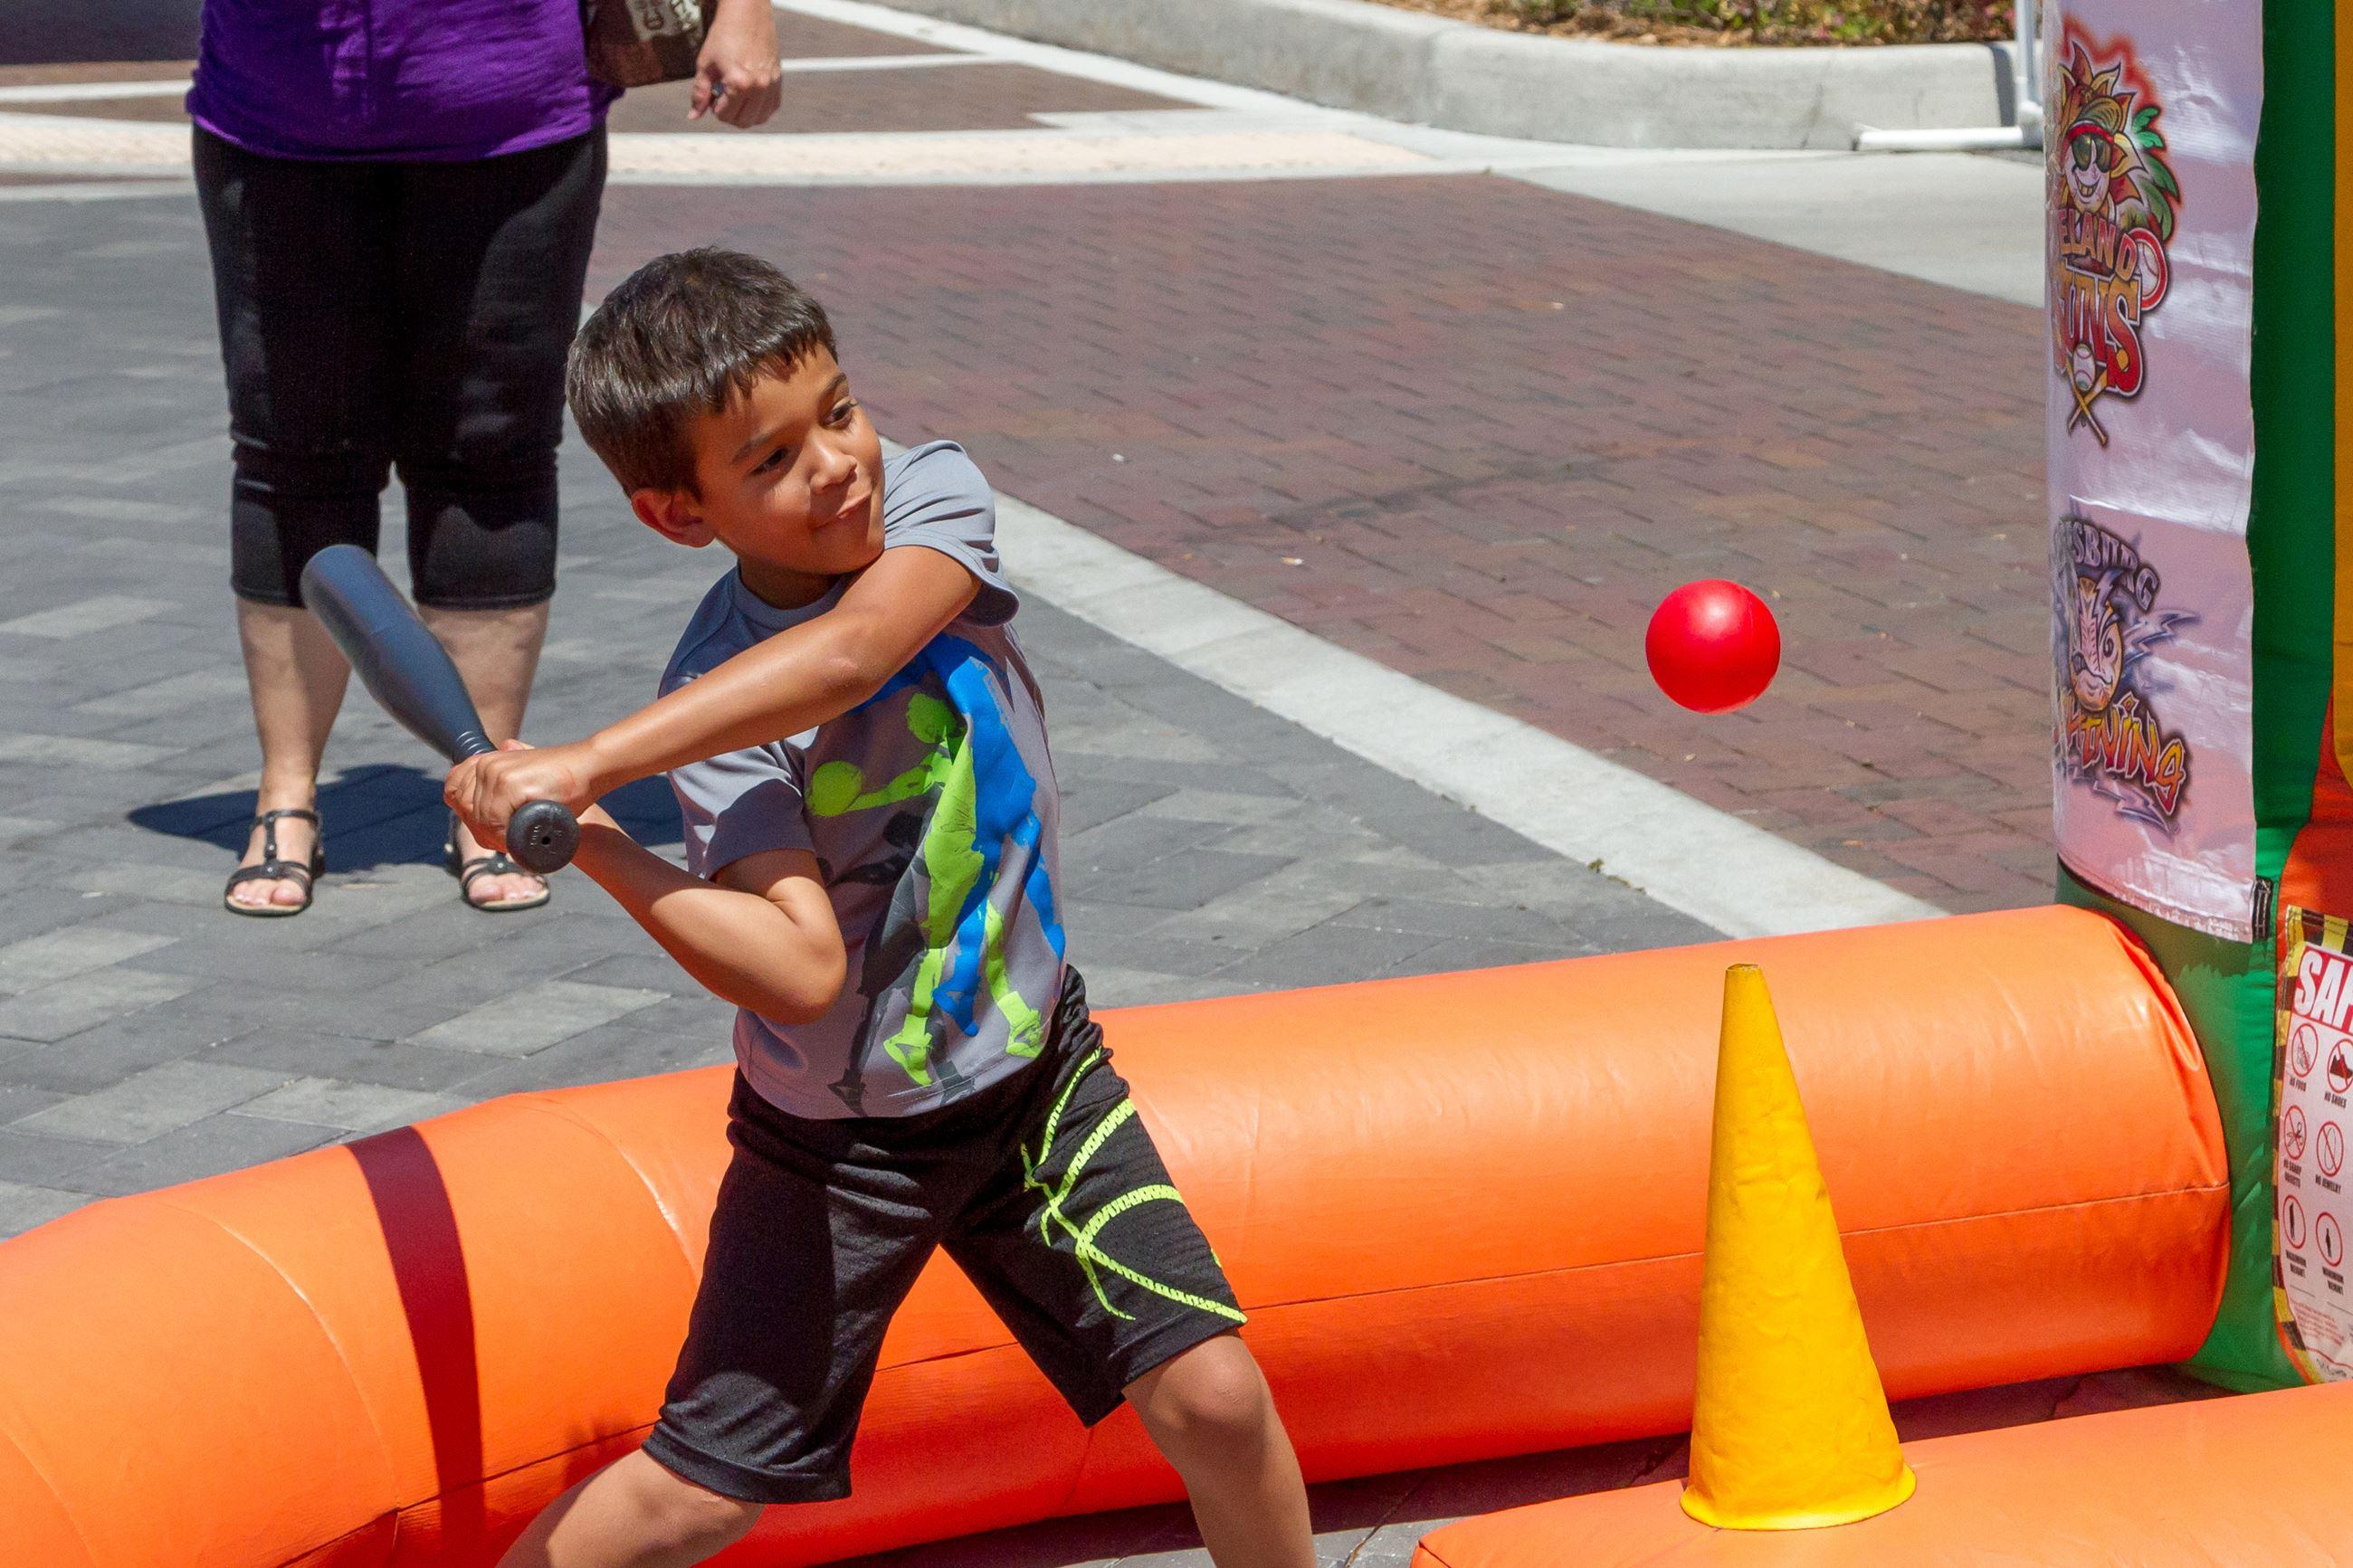 Cranes Roost Halloween 2020 Family Fest | Altamonte Springs, FL   Official Website